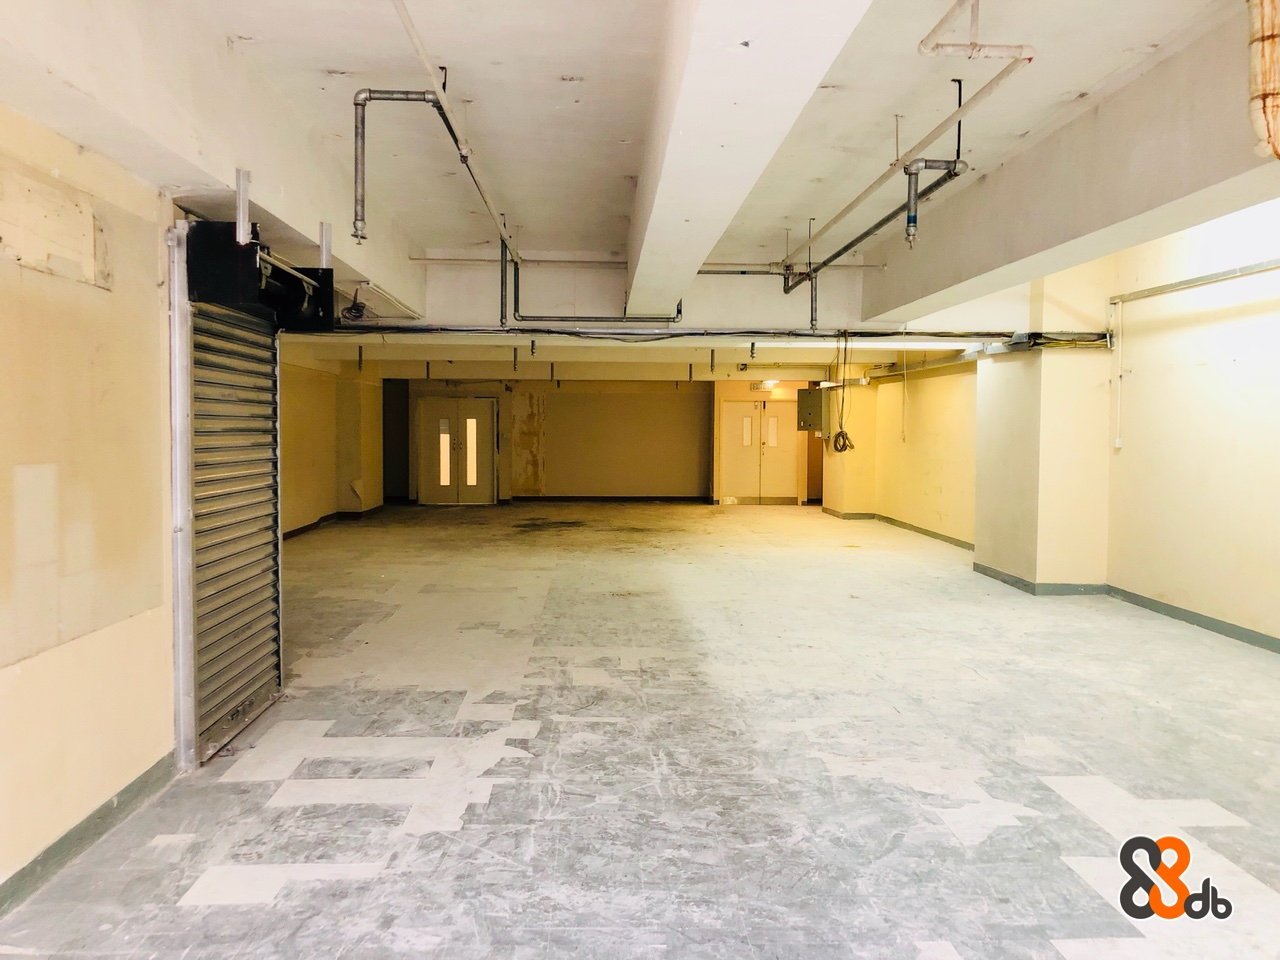 Floor,Building,Ceiling,Wall,Room